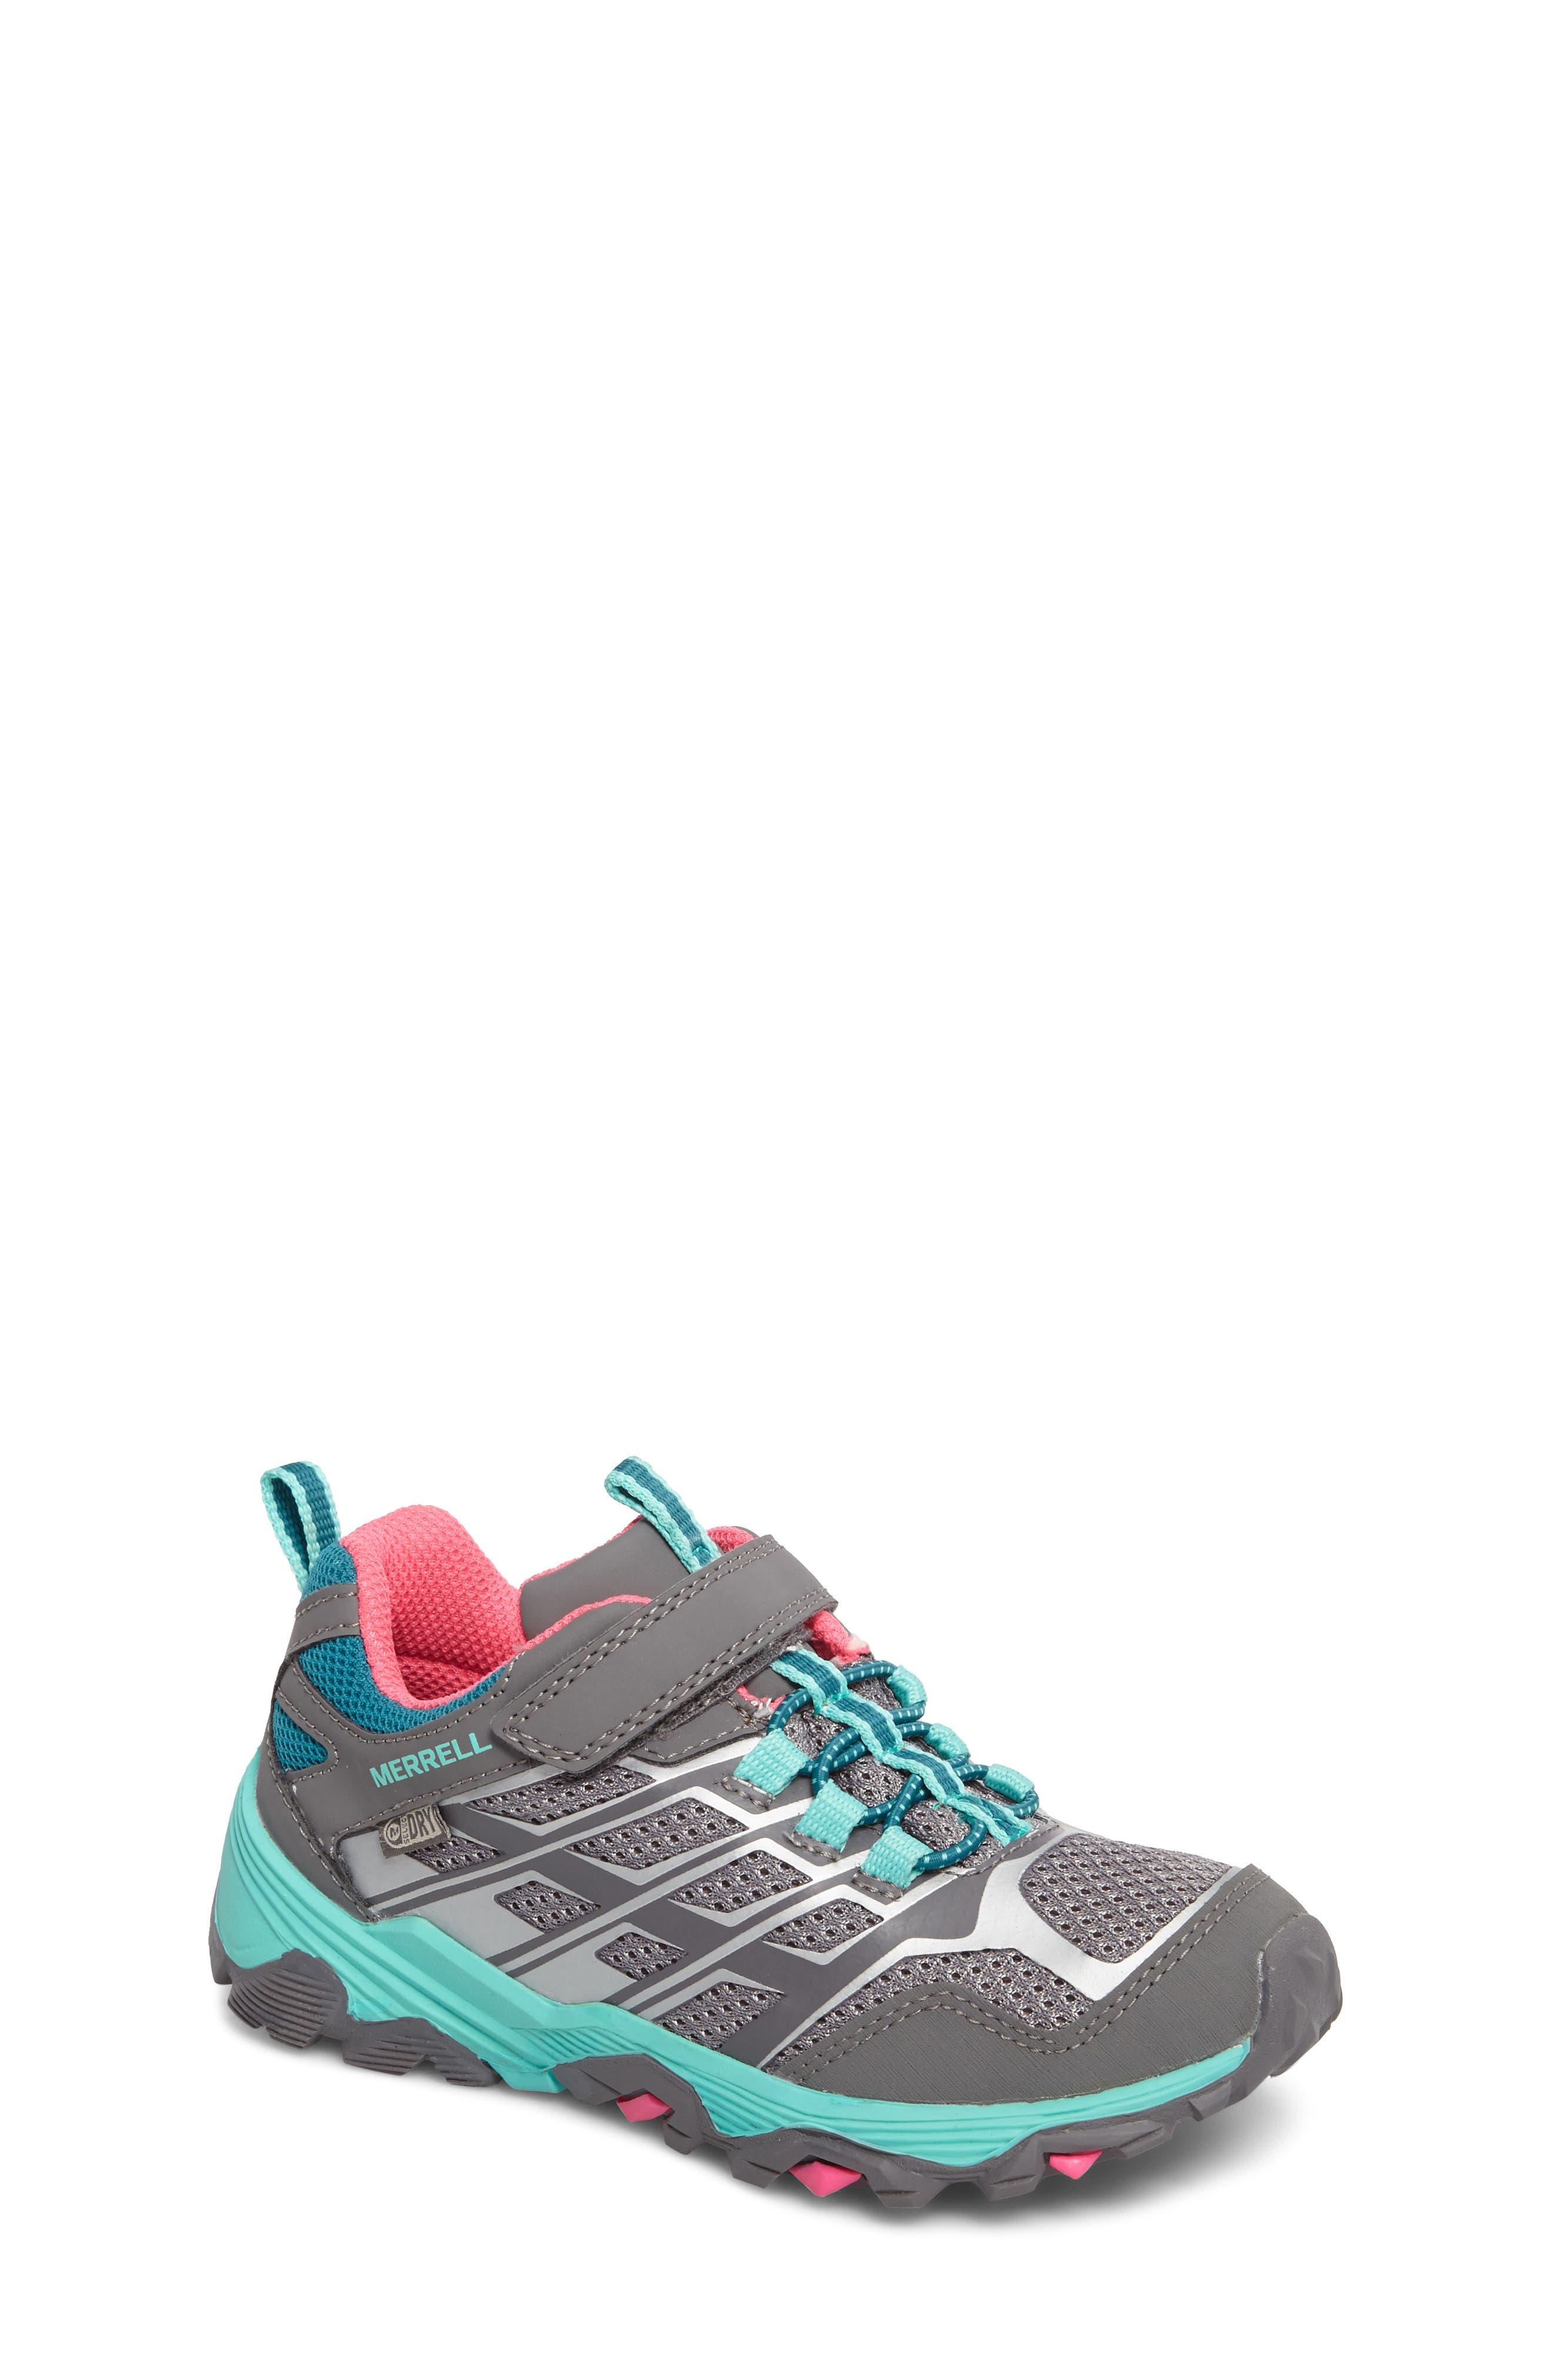 Moab FST Polar Low Waterproof Sneaker,                             Main thumbnail 1, color,                             Grey/ Multi